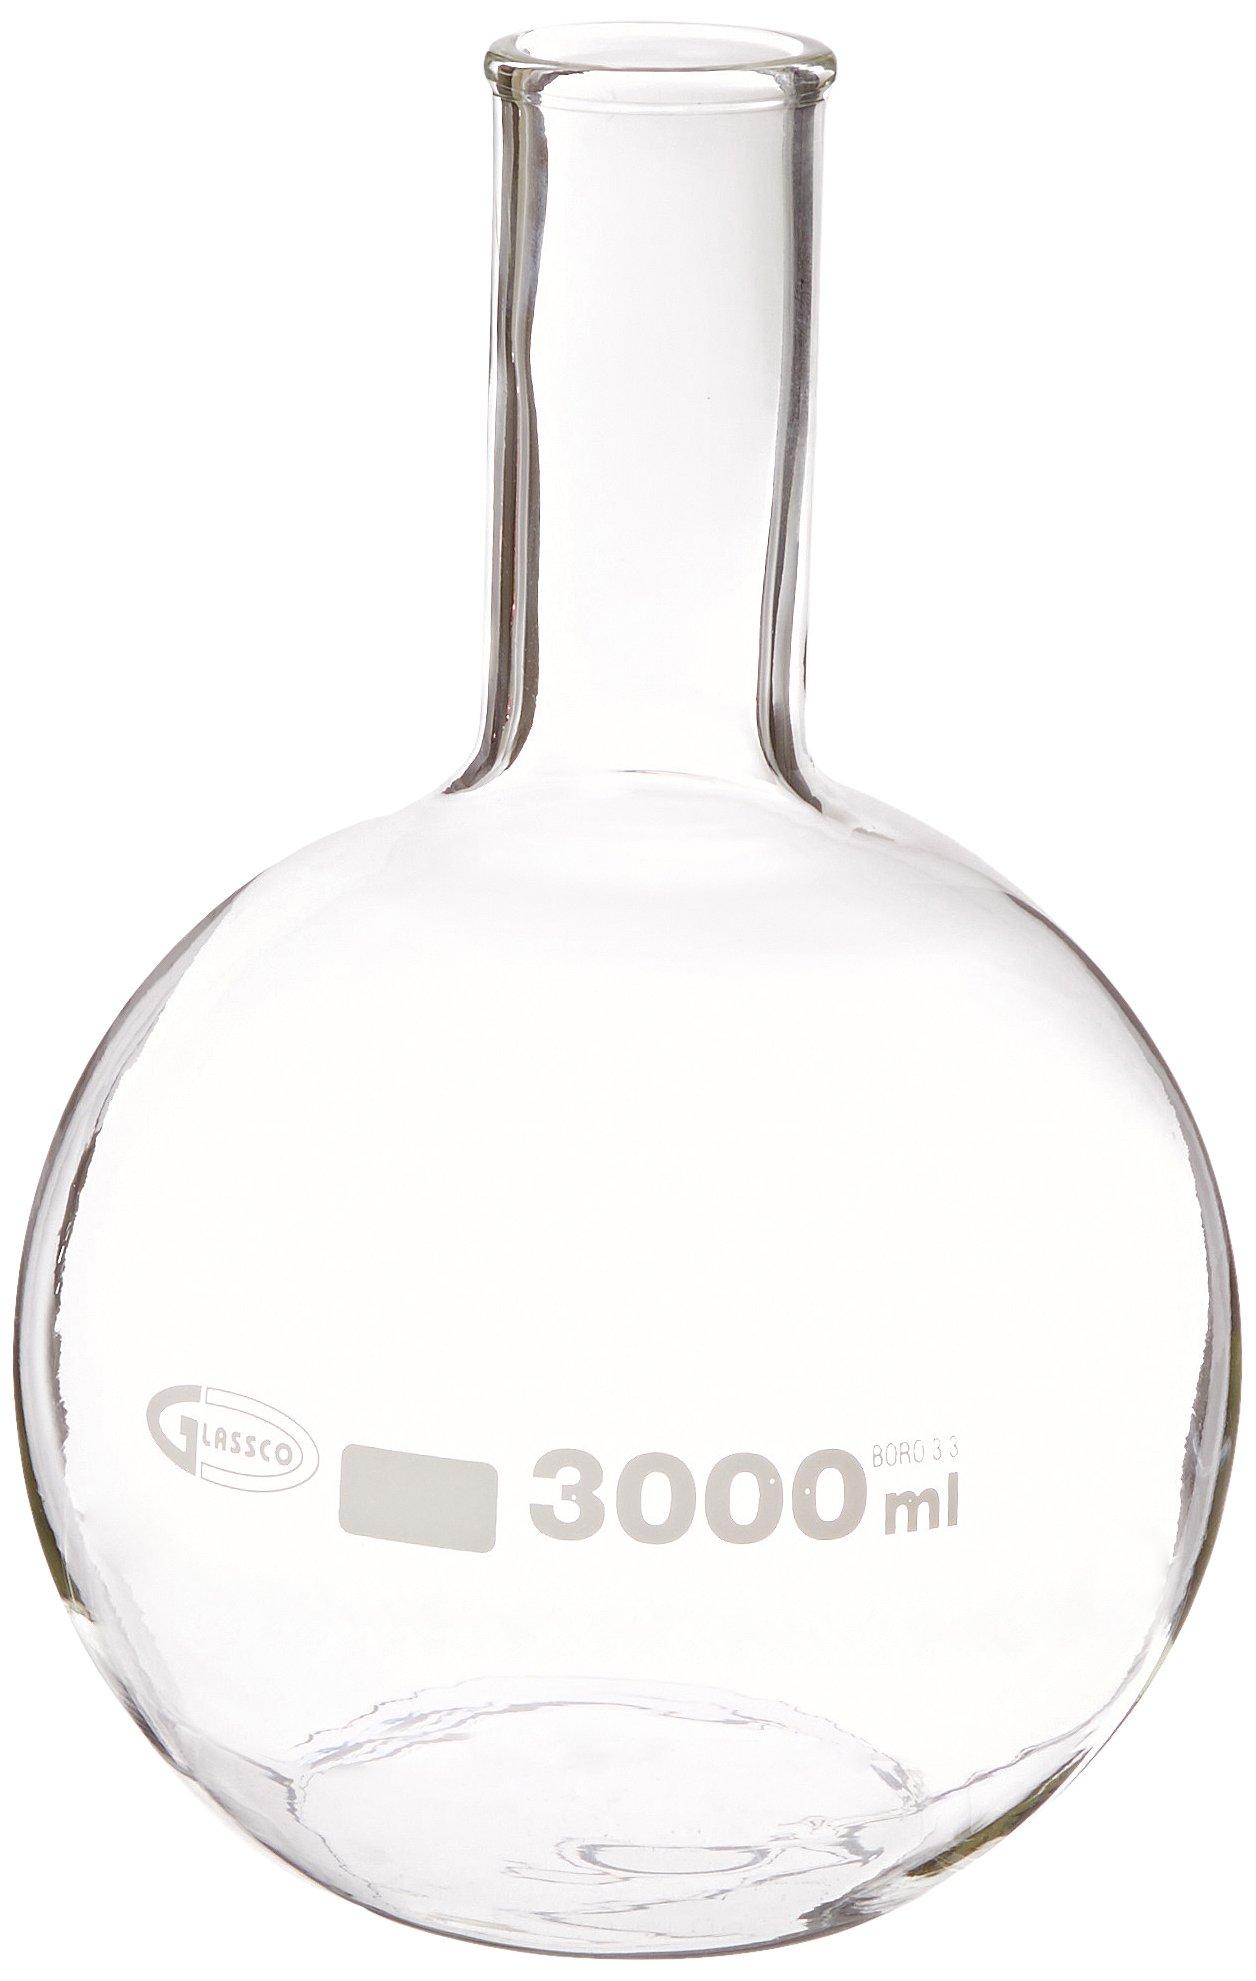 United Scientific FG4060-3000 Borosilicate Glass Flat Bottom Boiling Flask, 3000ml Capacity